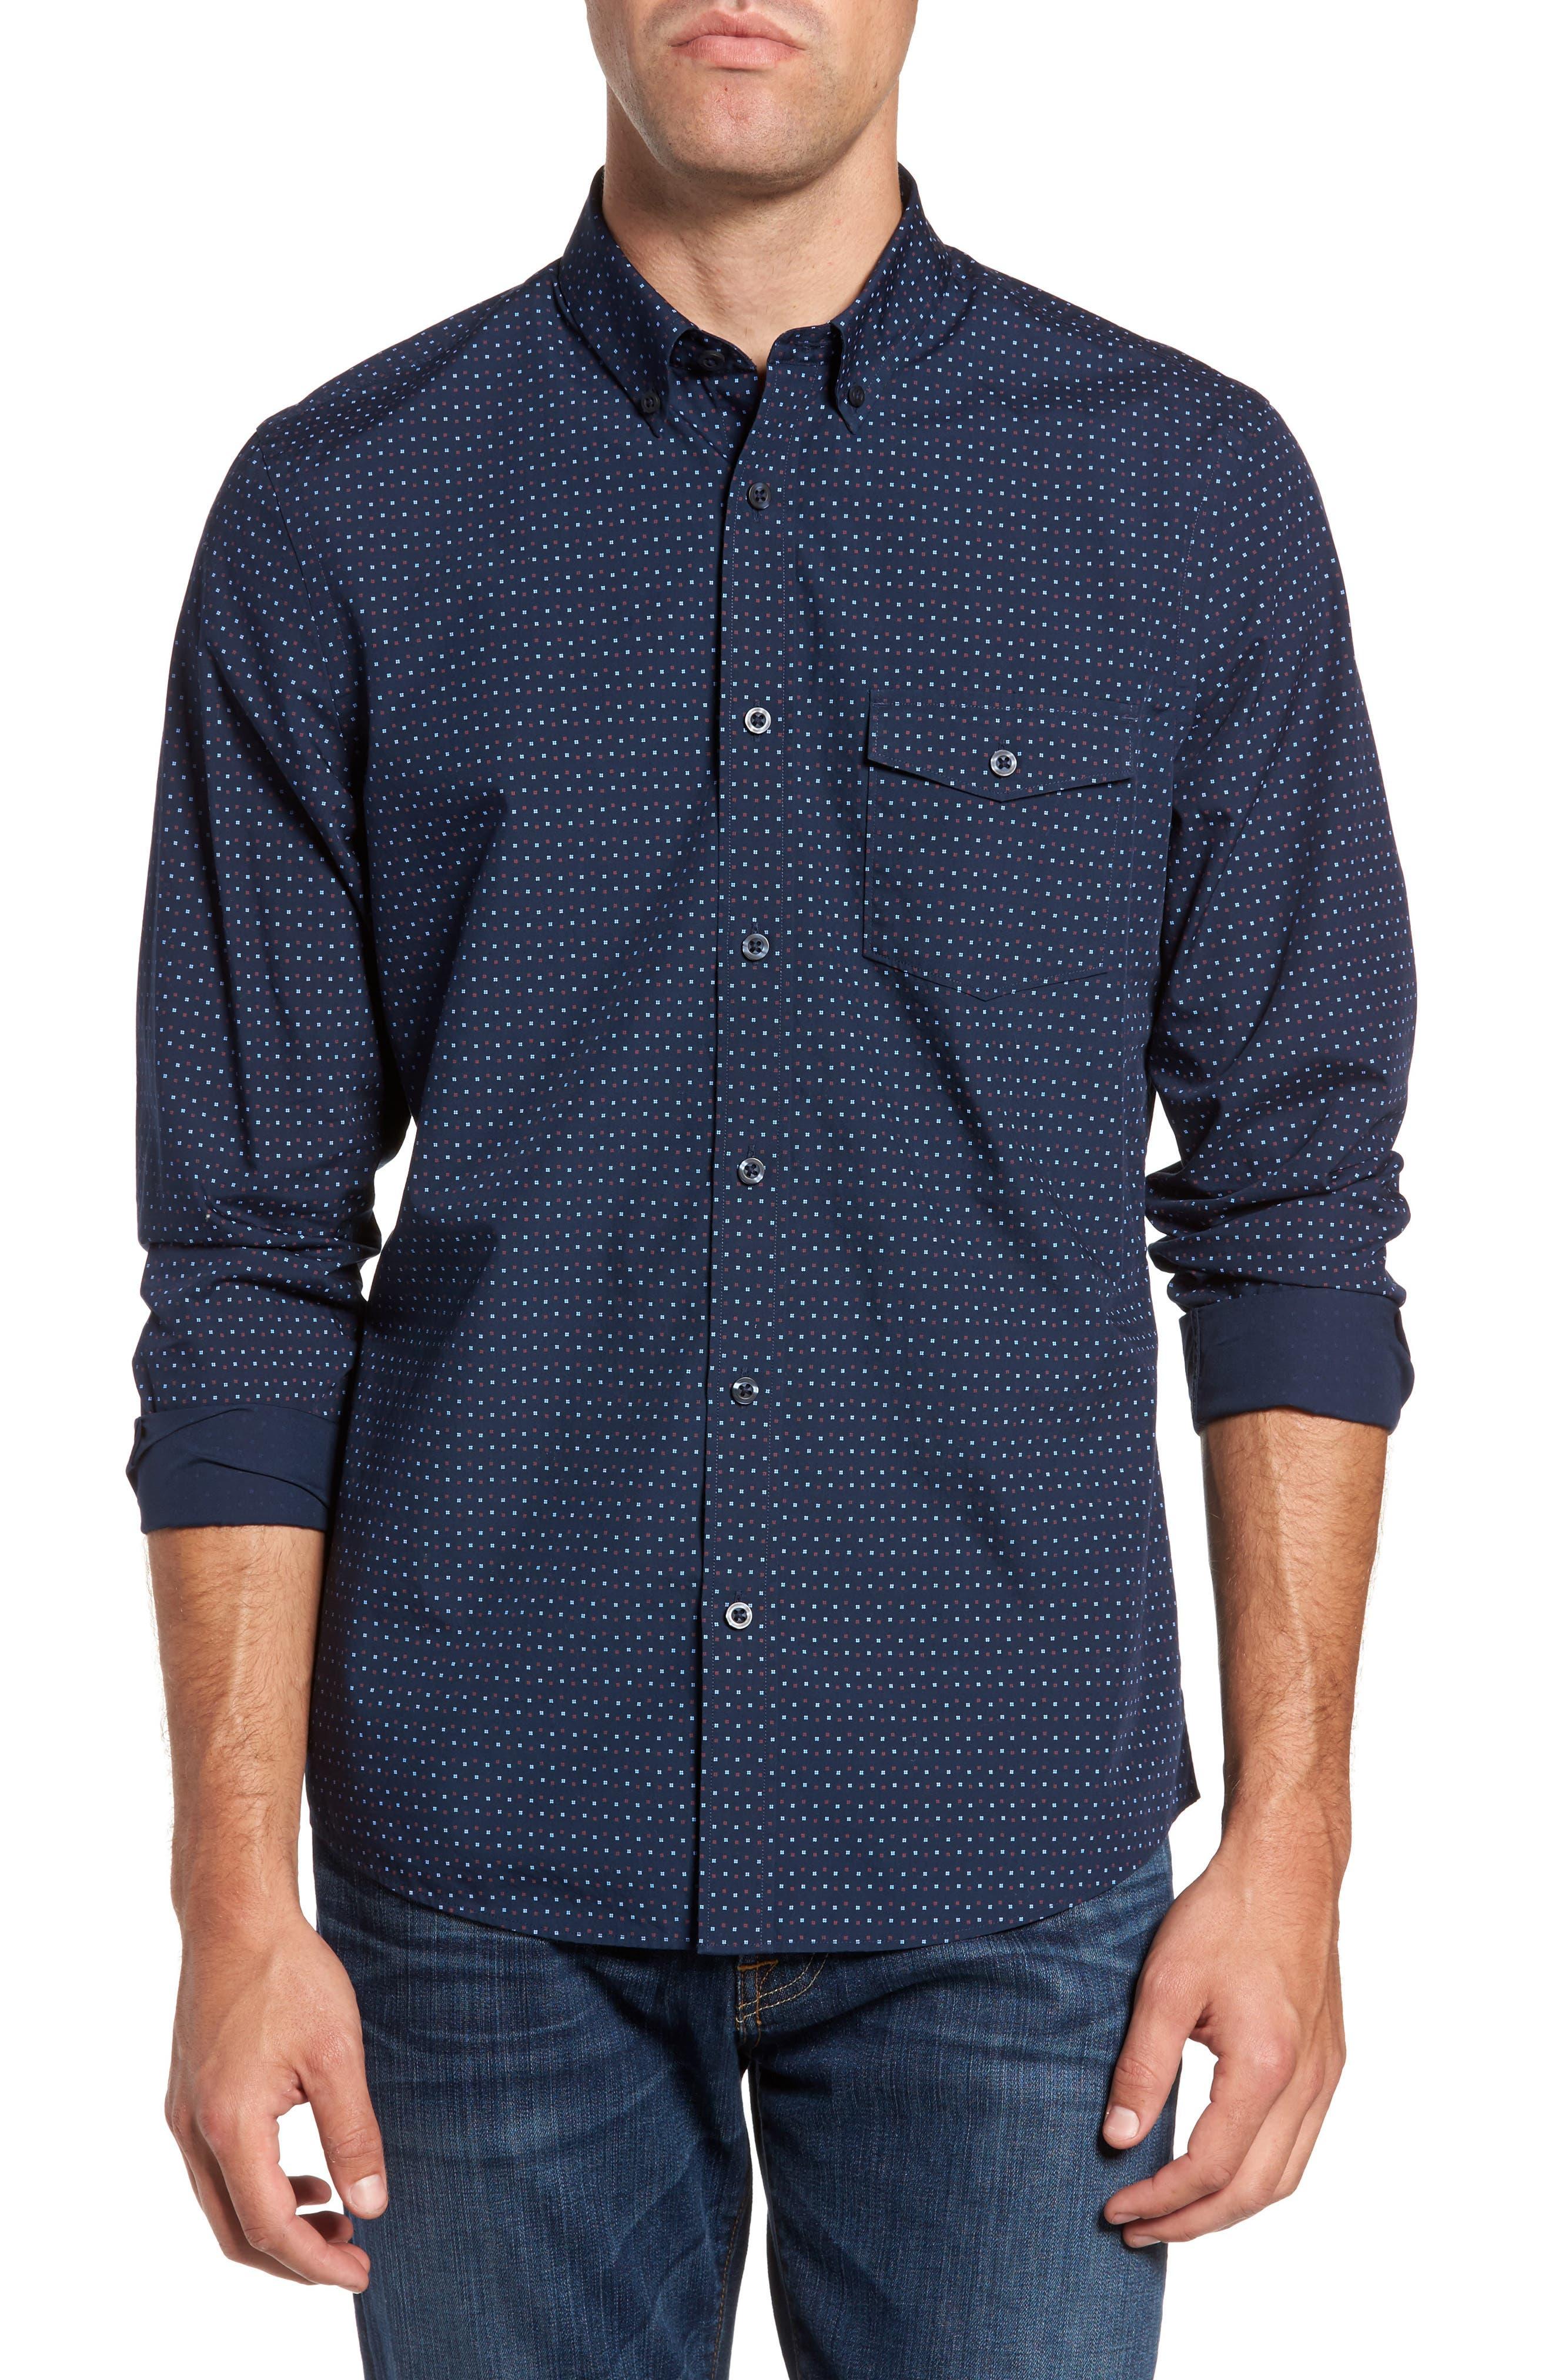 Alternate Image 1 Selected - Nordstrom Men's Shop Ivy Trim Fit Print Sport Shirt (Tall)